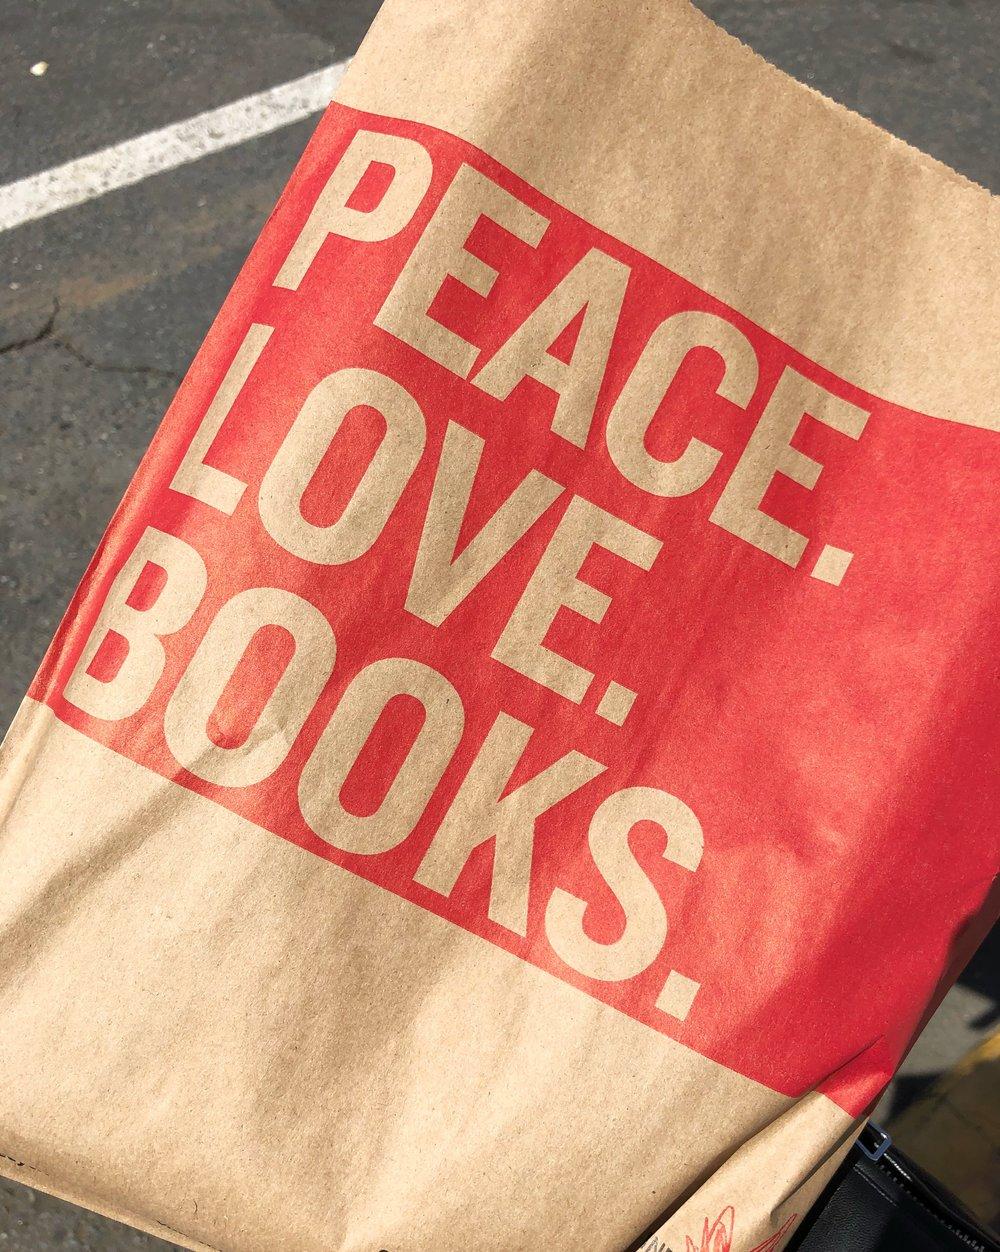 park-road-books-charlotte-nc